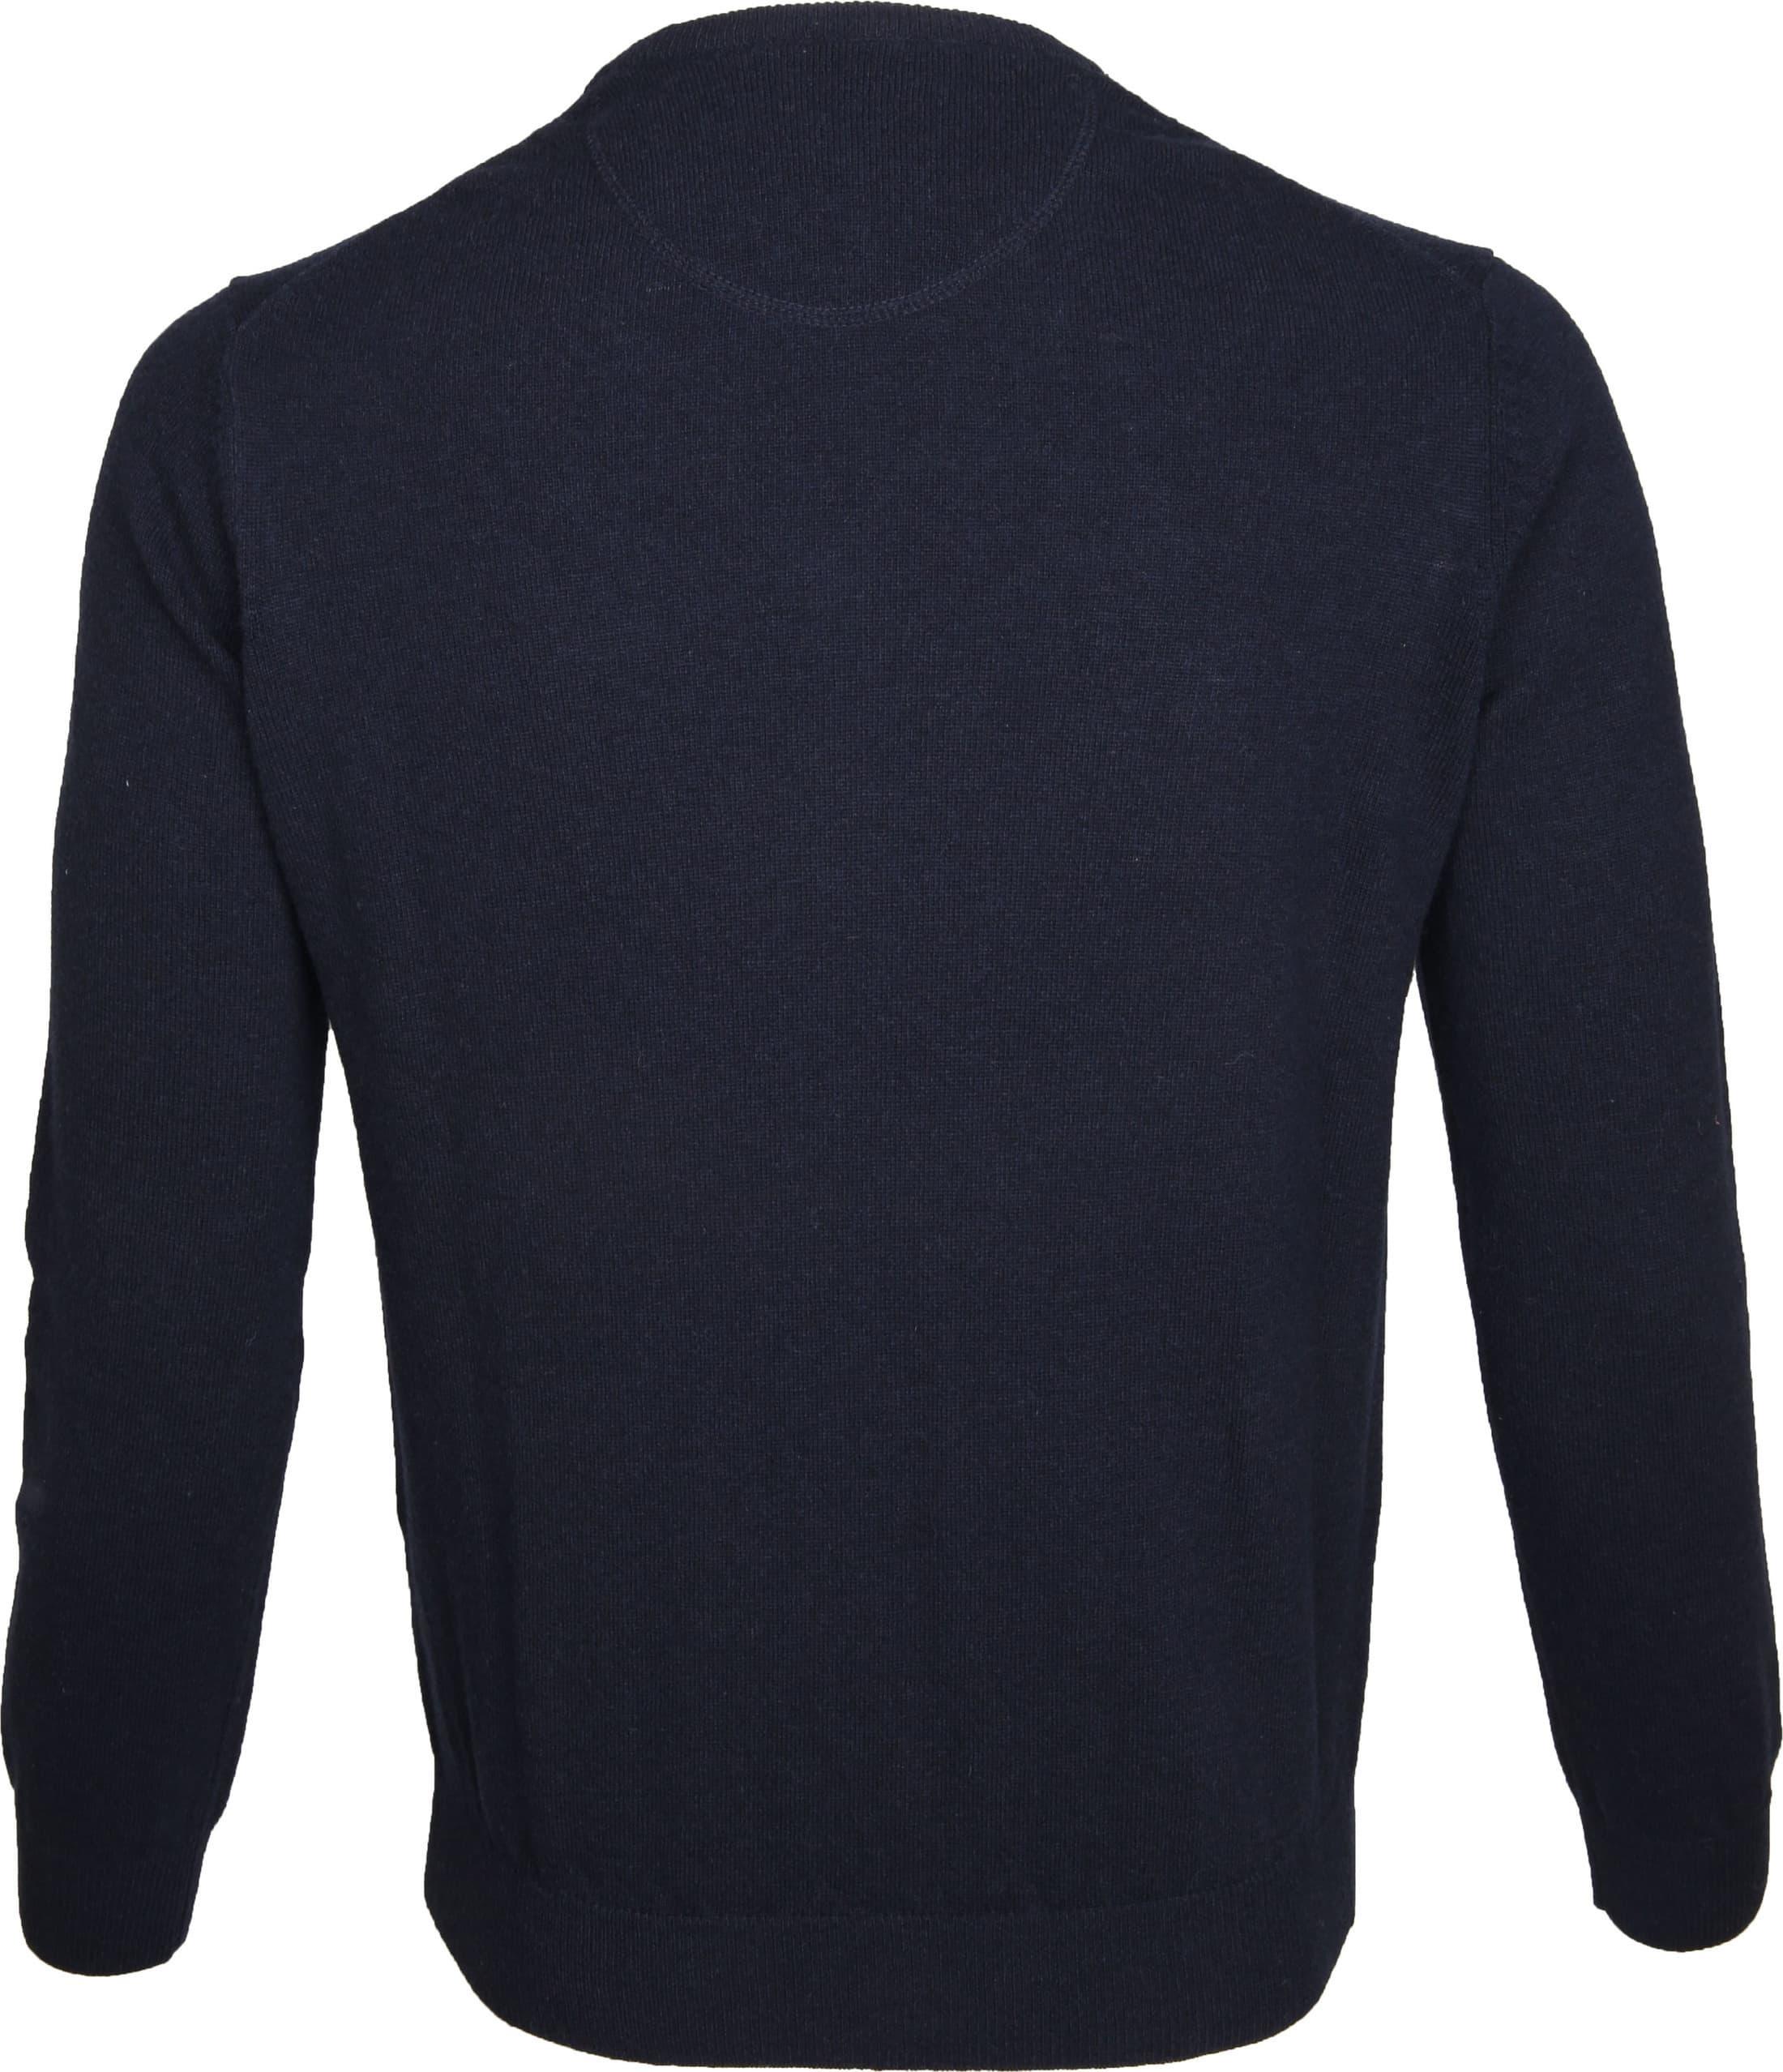 Suitable Pullover Lammwolle V-Ausschnitt Dunkelblau foto 2